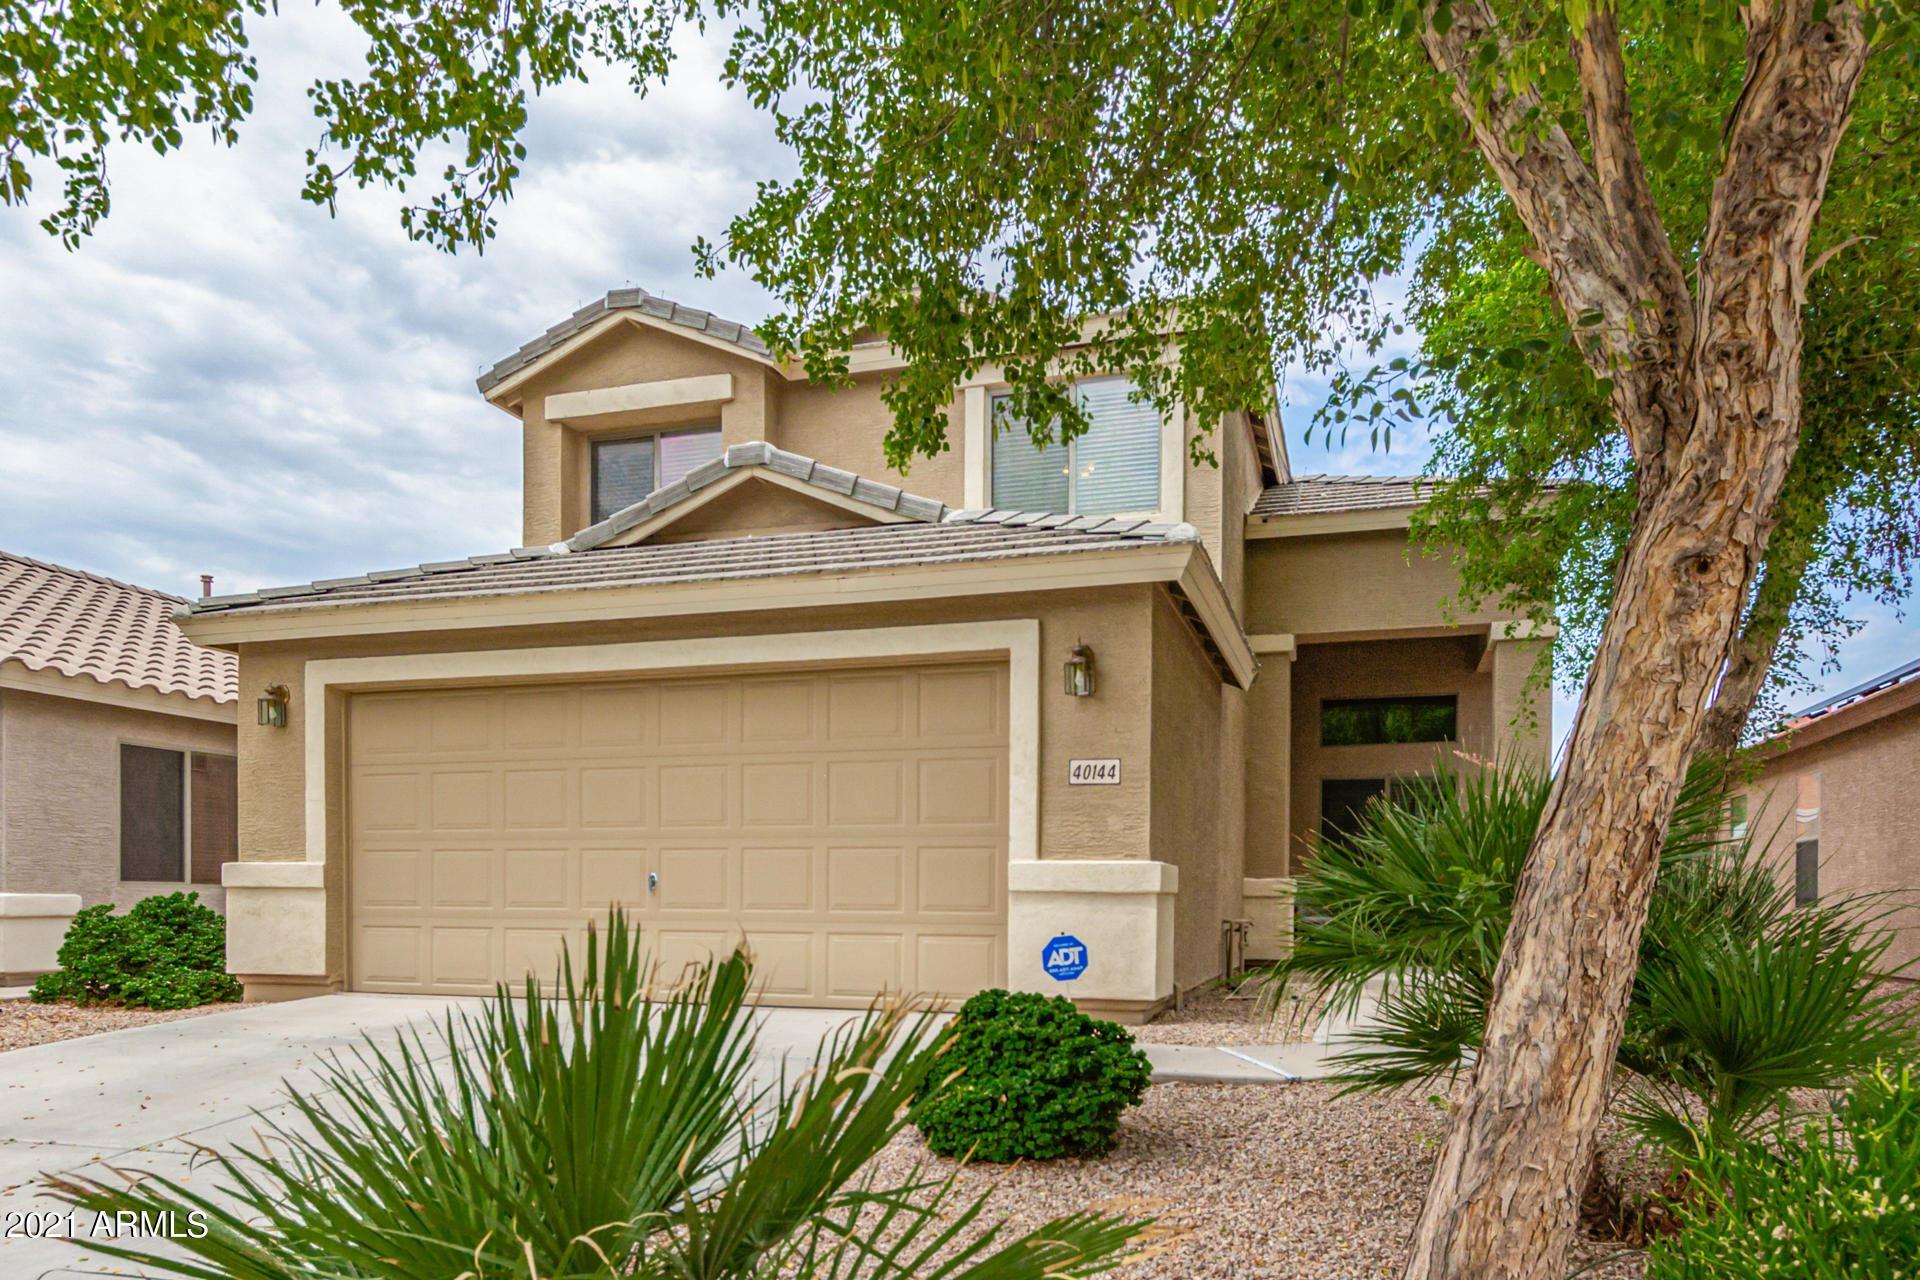 Photo of 40144 W SANDERS Way, Maricopa, AZ 85138 (MLS # 6268808)